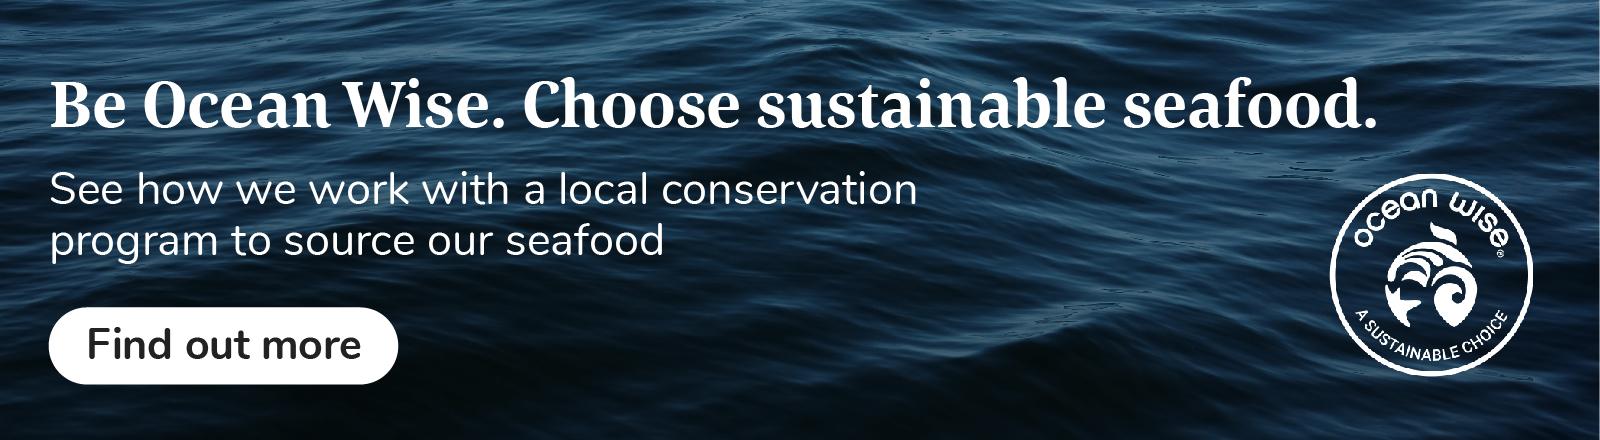 Be Ocean Wise. Choose sustainable seafood.